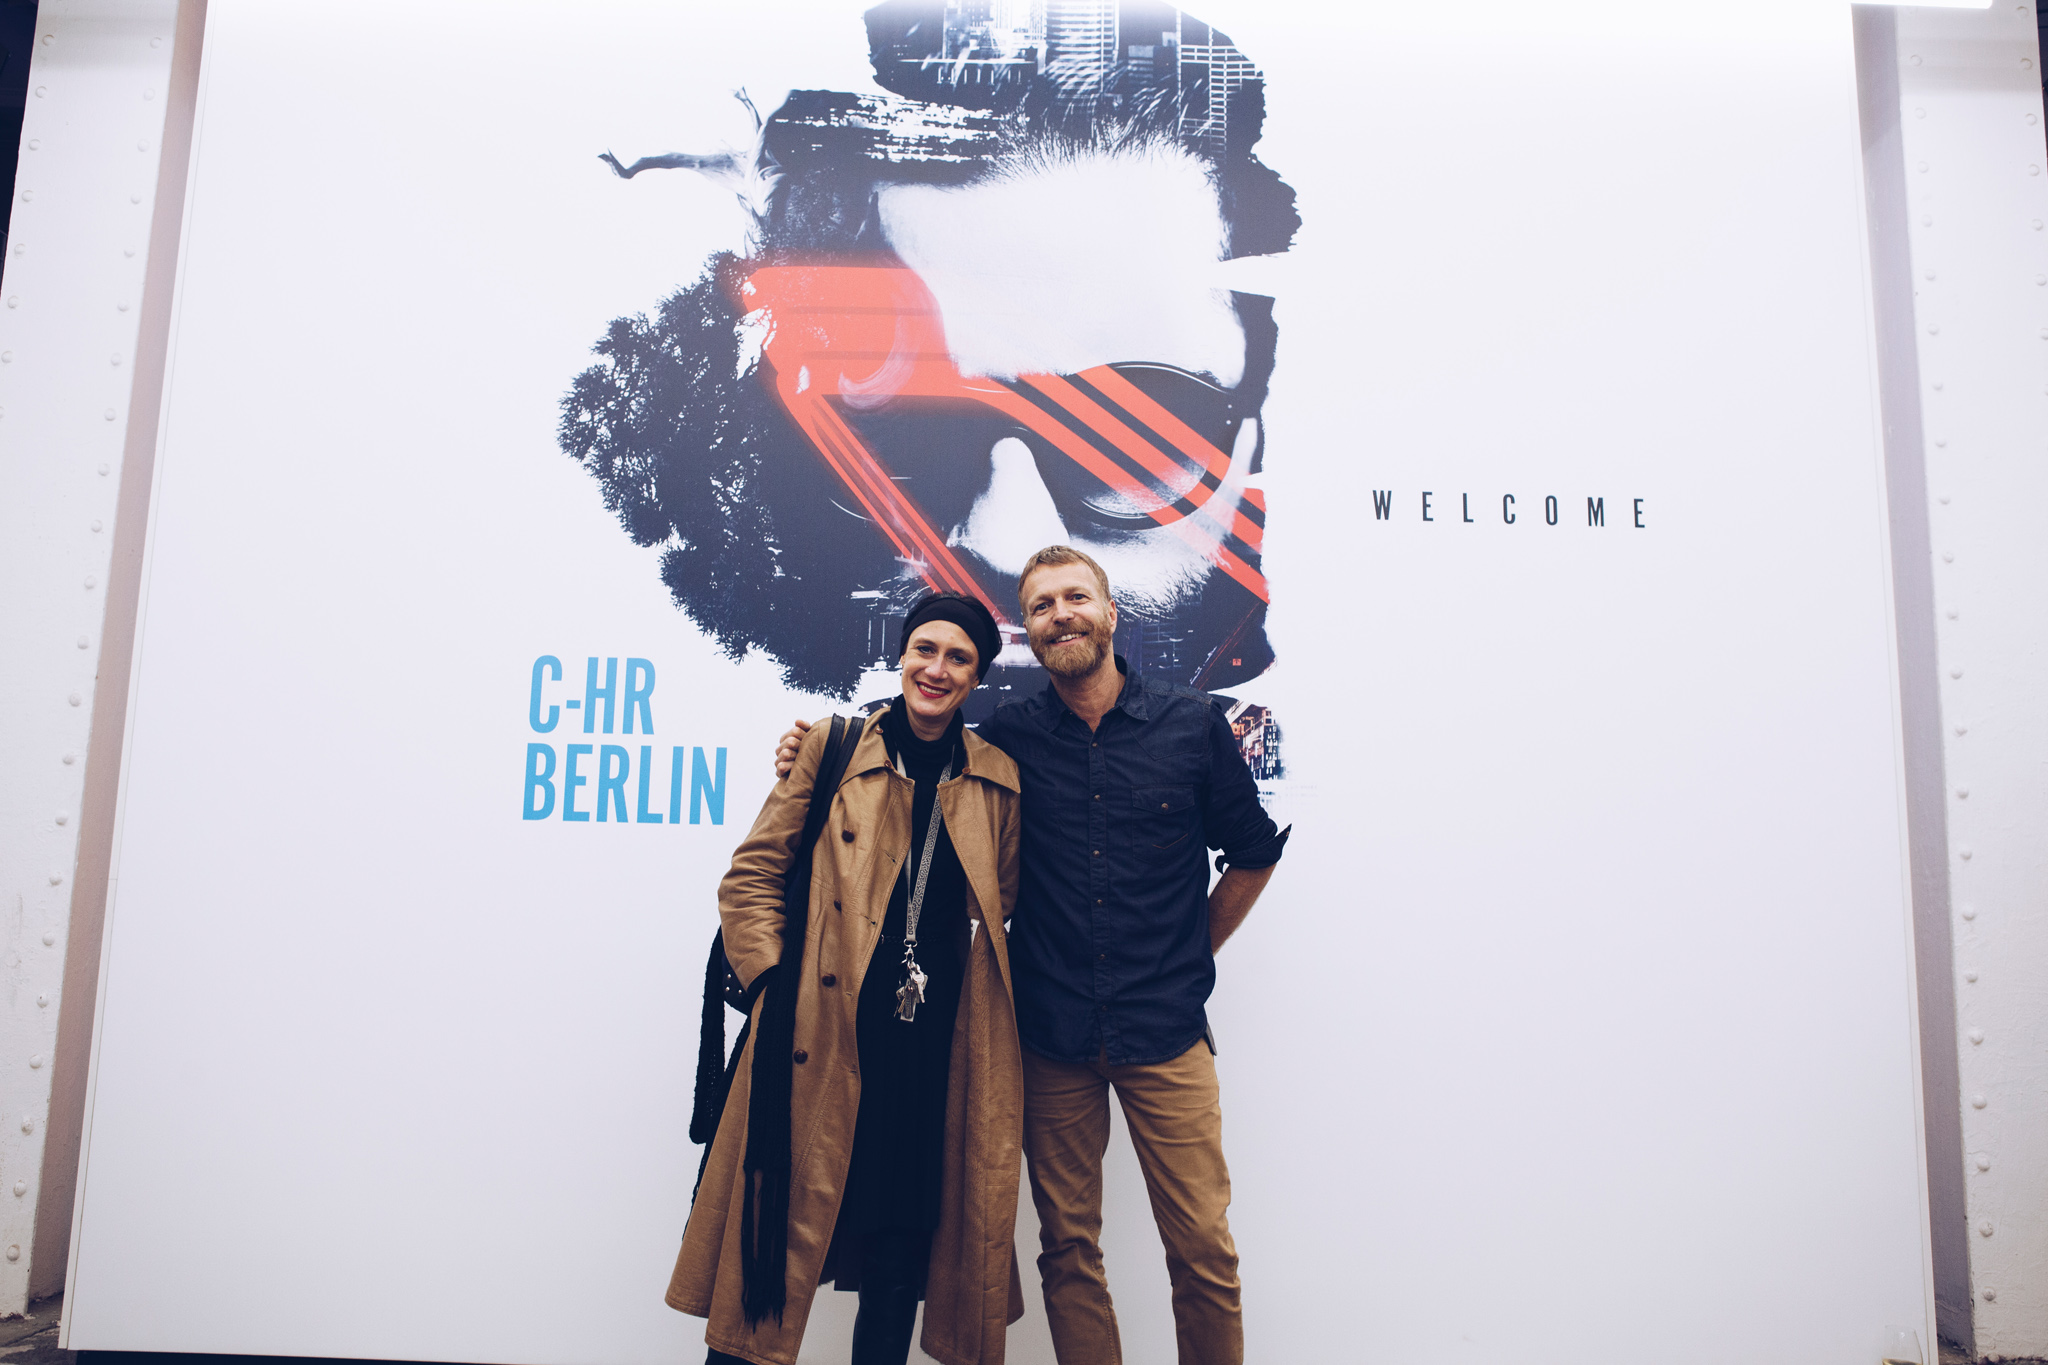 C-HR_BERLIN_1-0269.jpg